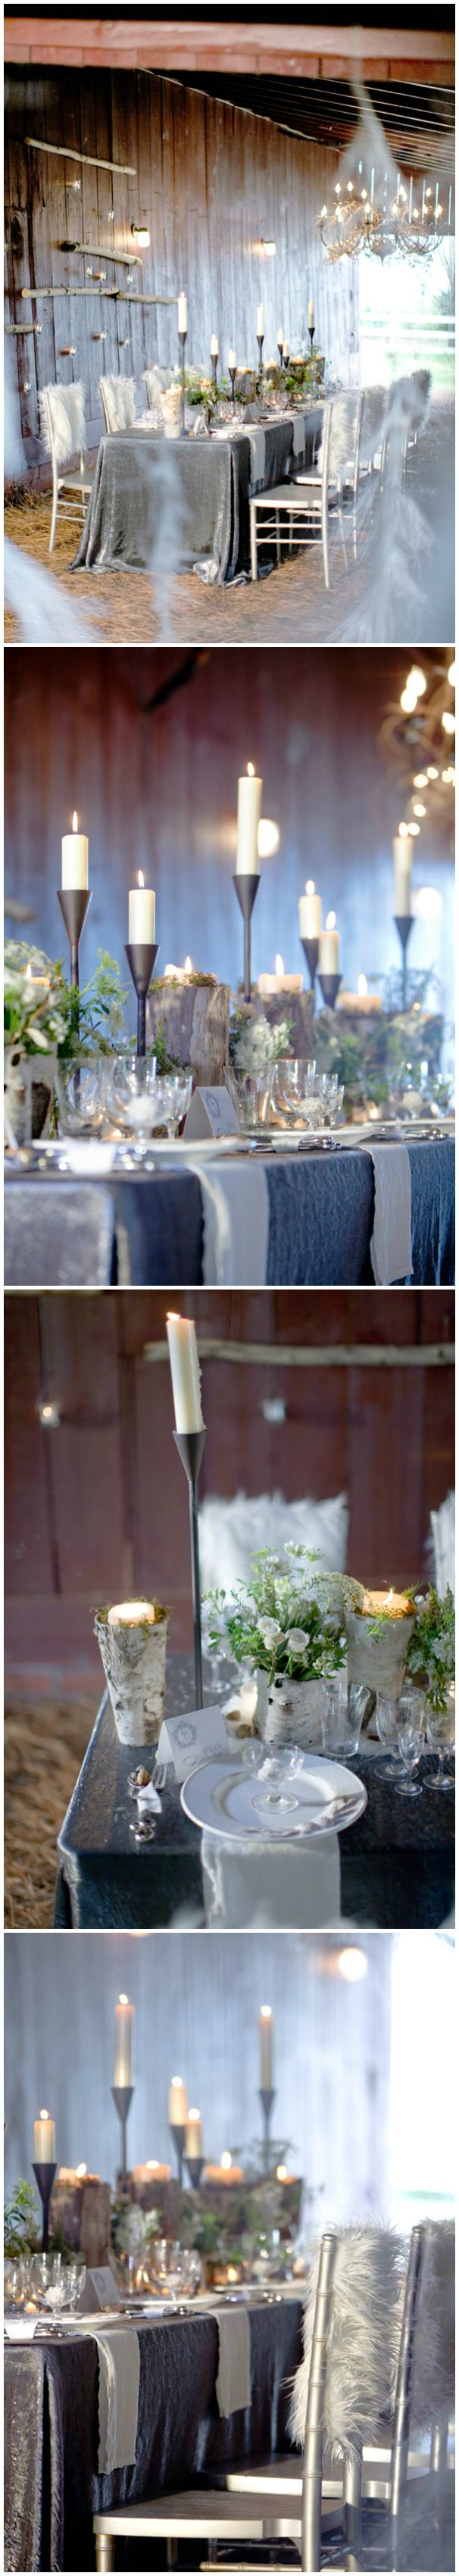 Wedding u2014 Tablescape Reception Dcor u2014 Rustic